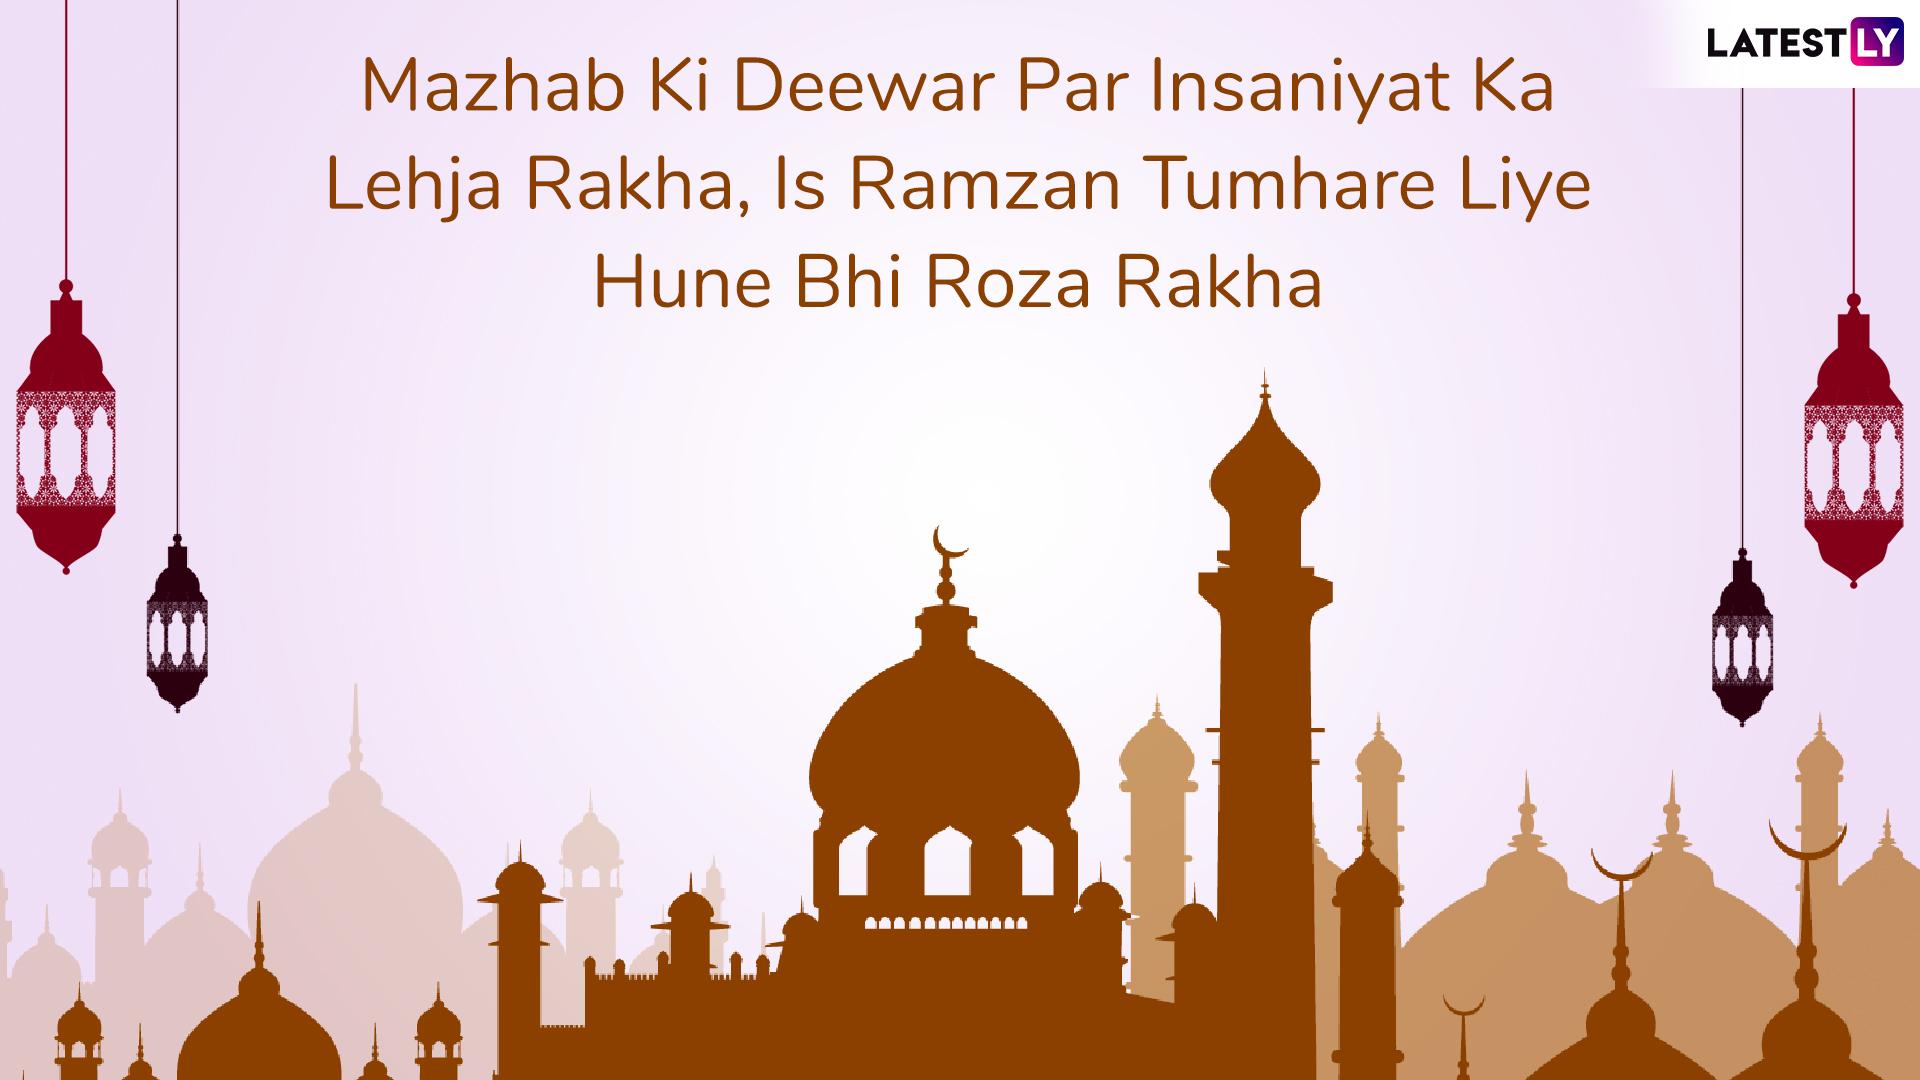 ramzan mubarak shayari 2019  ramadan kareem messages  image greetings and wishes to send during